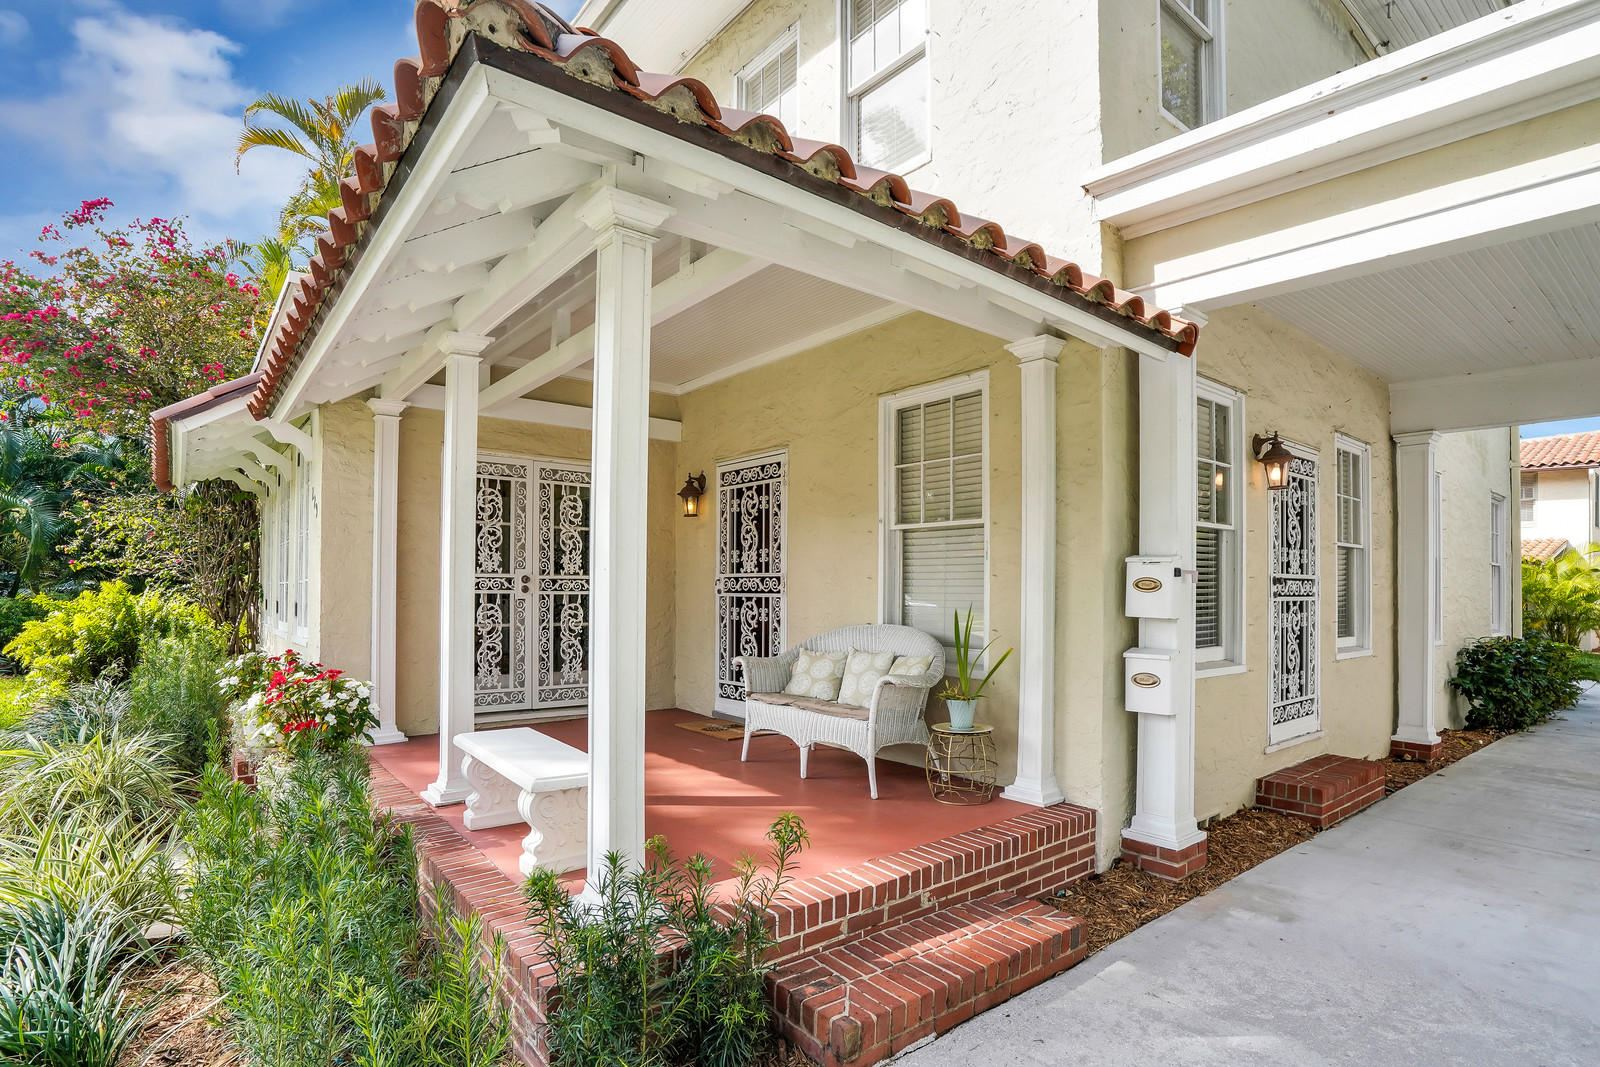 Photo of 229 9th Street, West Palm Beach, FL 33401 (MLS # RX-10602217)